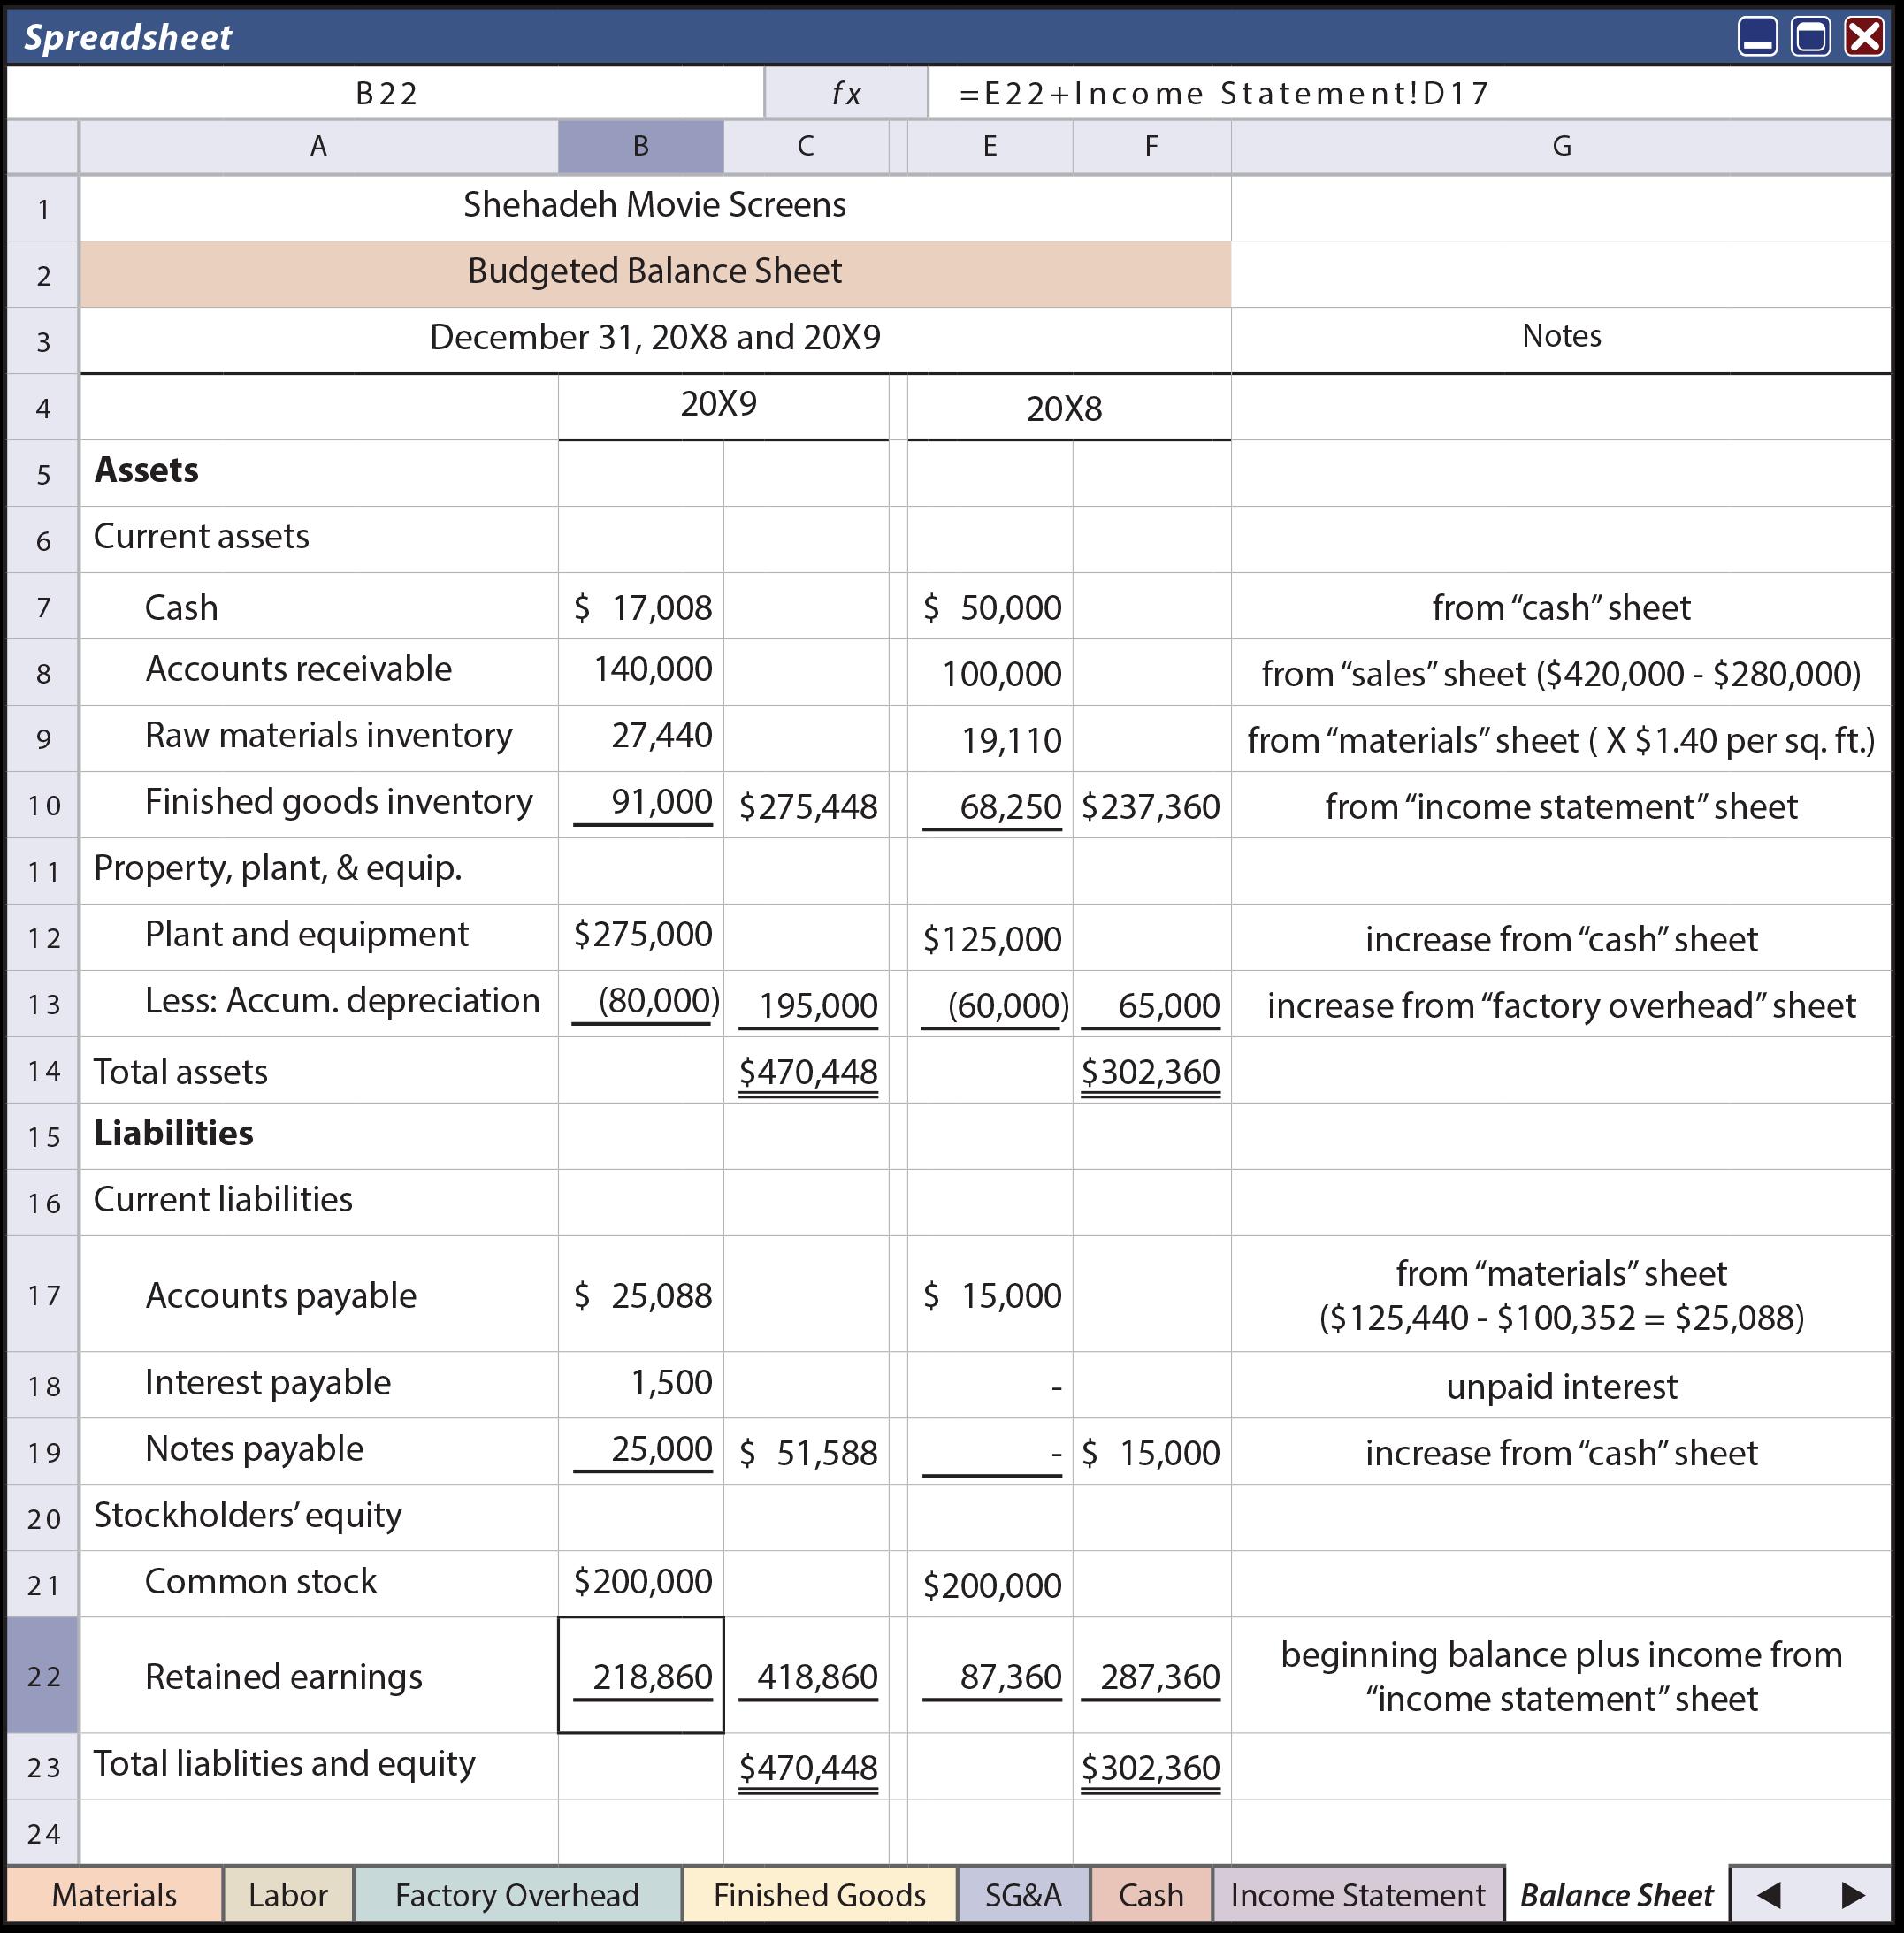 Master Budget Component - Budgeted Balance Sheet